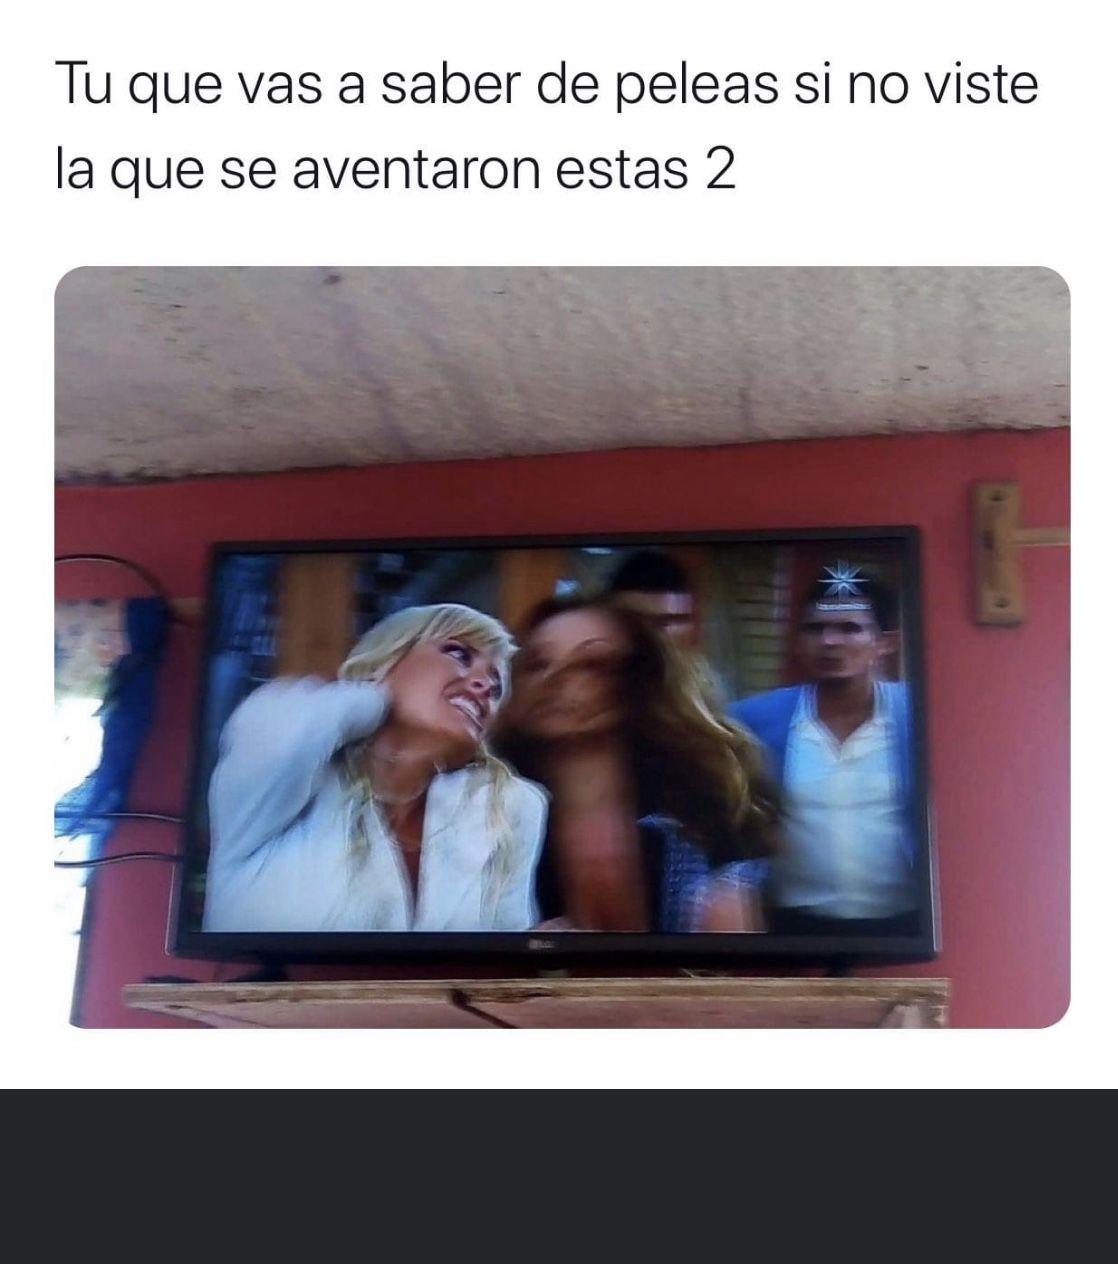 Novelas Megasuper Chido Y Latino Actors Angelica Rivera Tv Shows